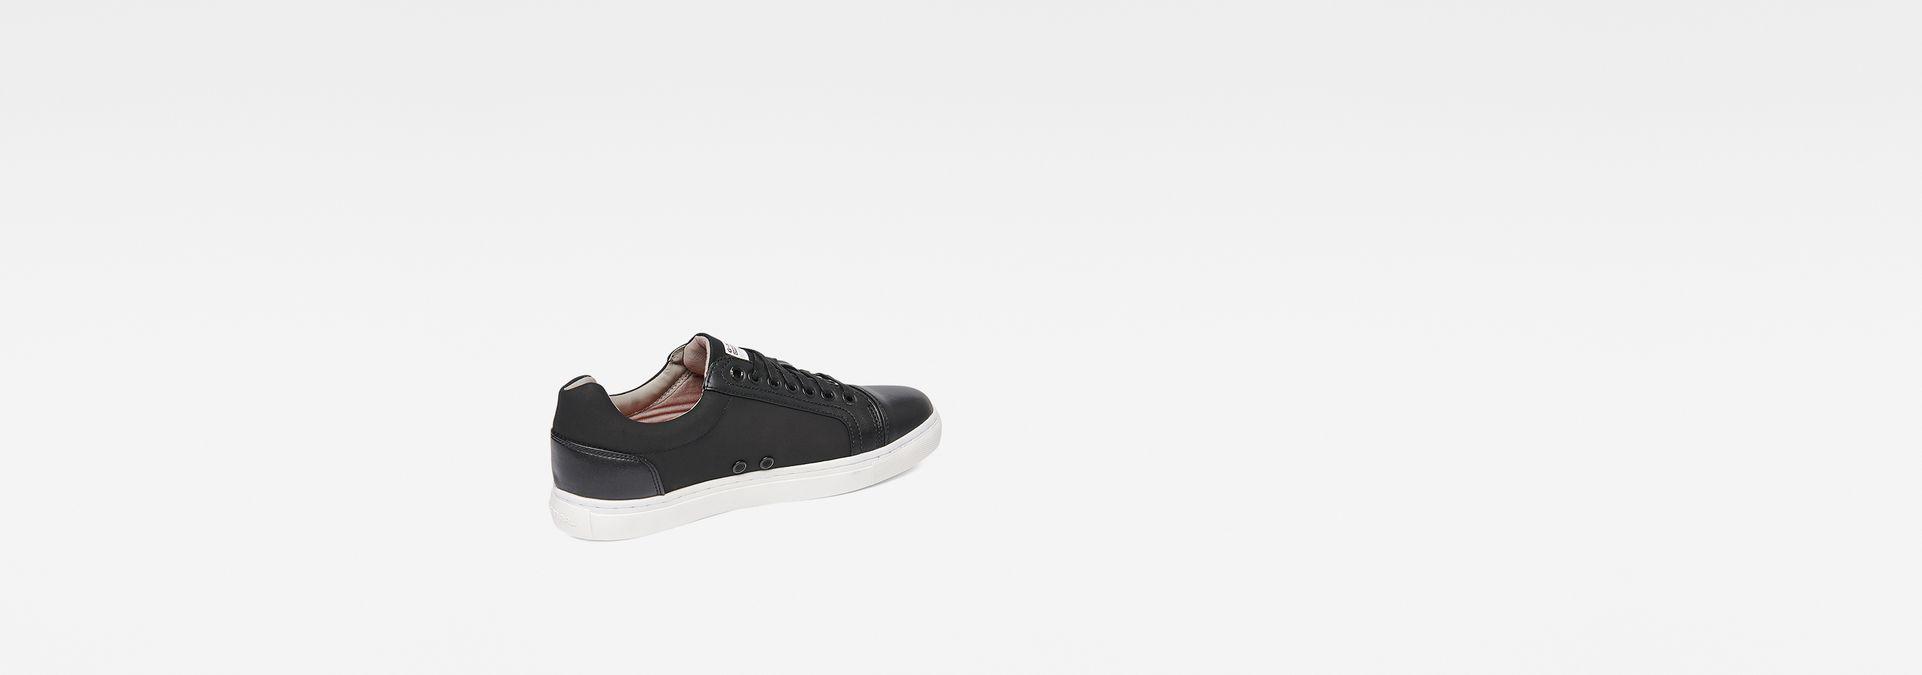 toublo sneakers black men sale g star raw. Black Bedroom Furniture Sets. Home Design Ideas